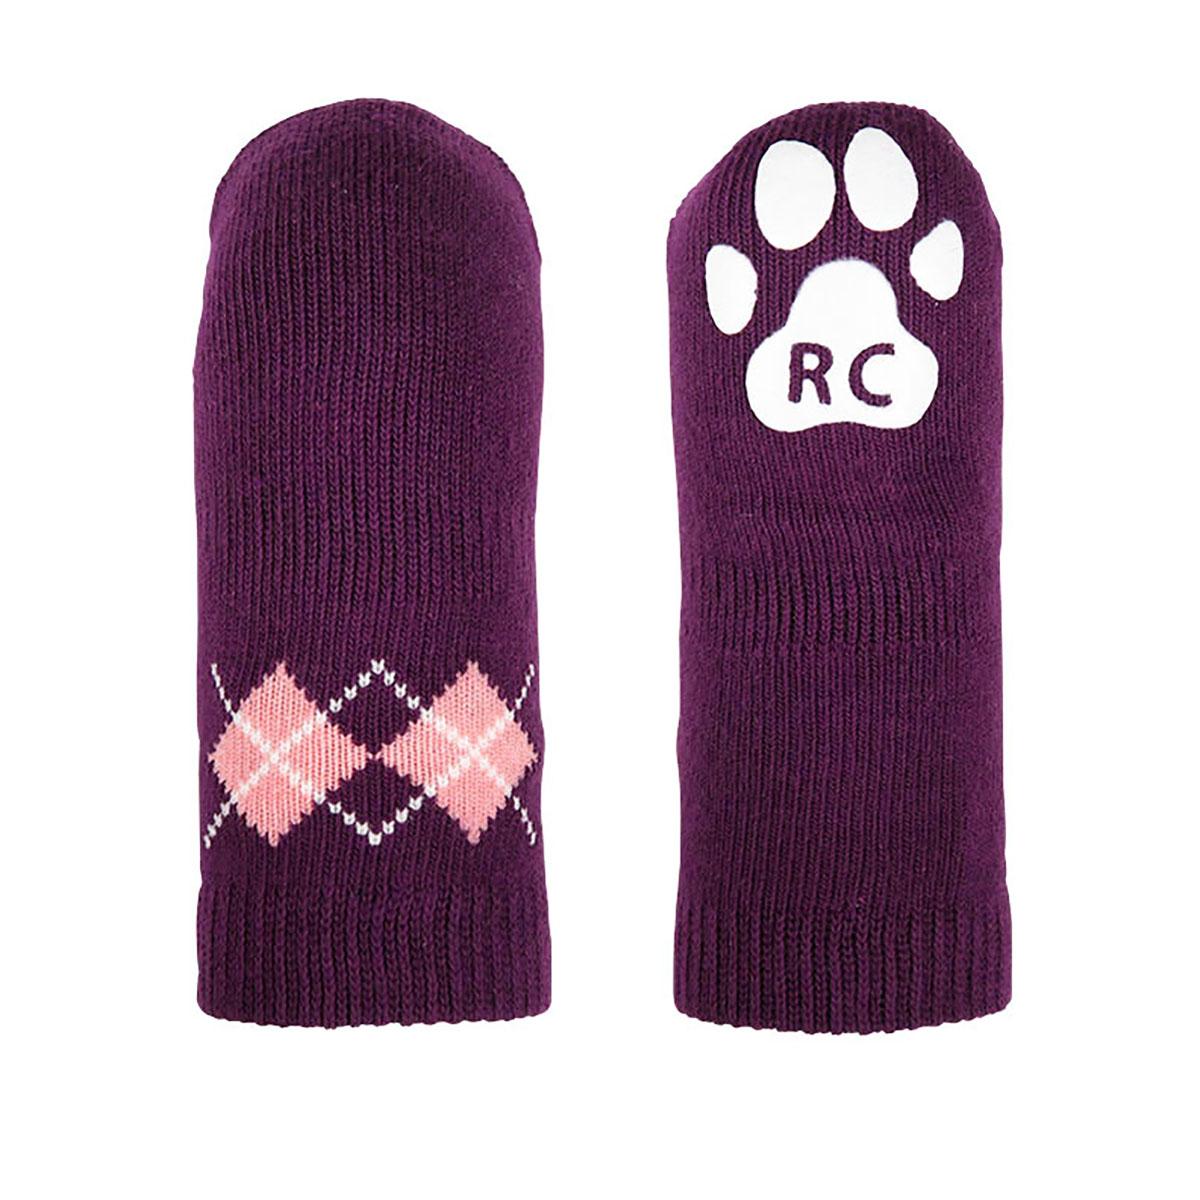 Argyle PAWKS Dog Socks - Grape